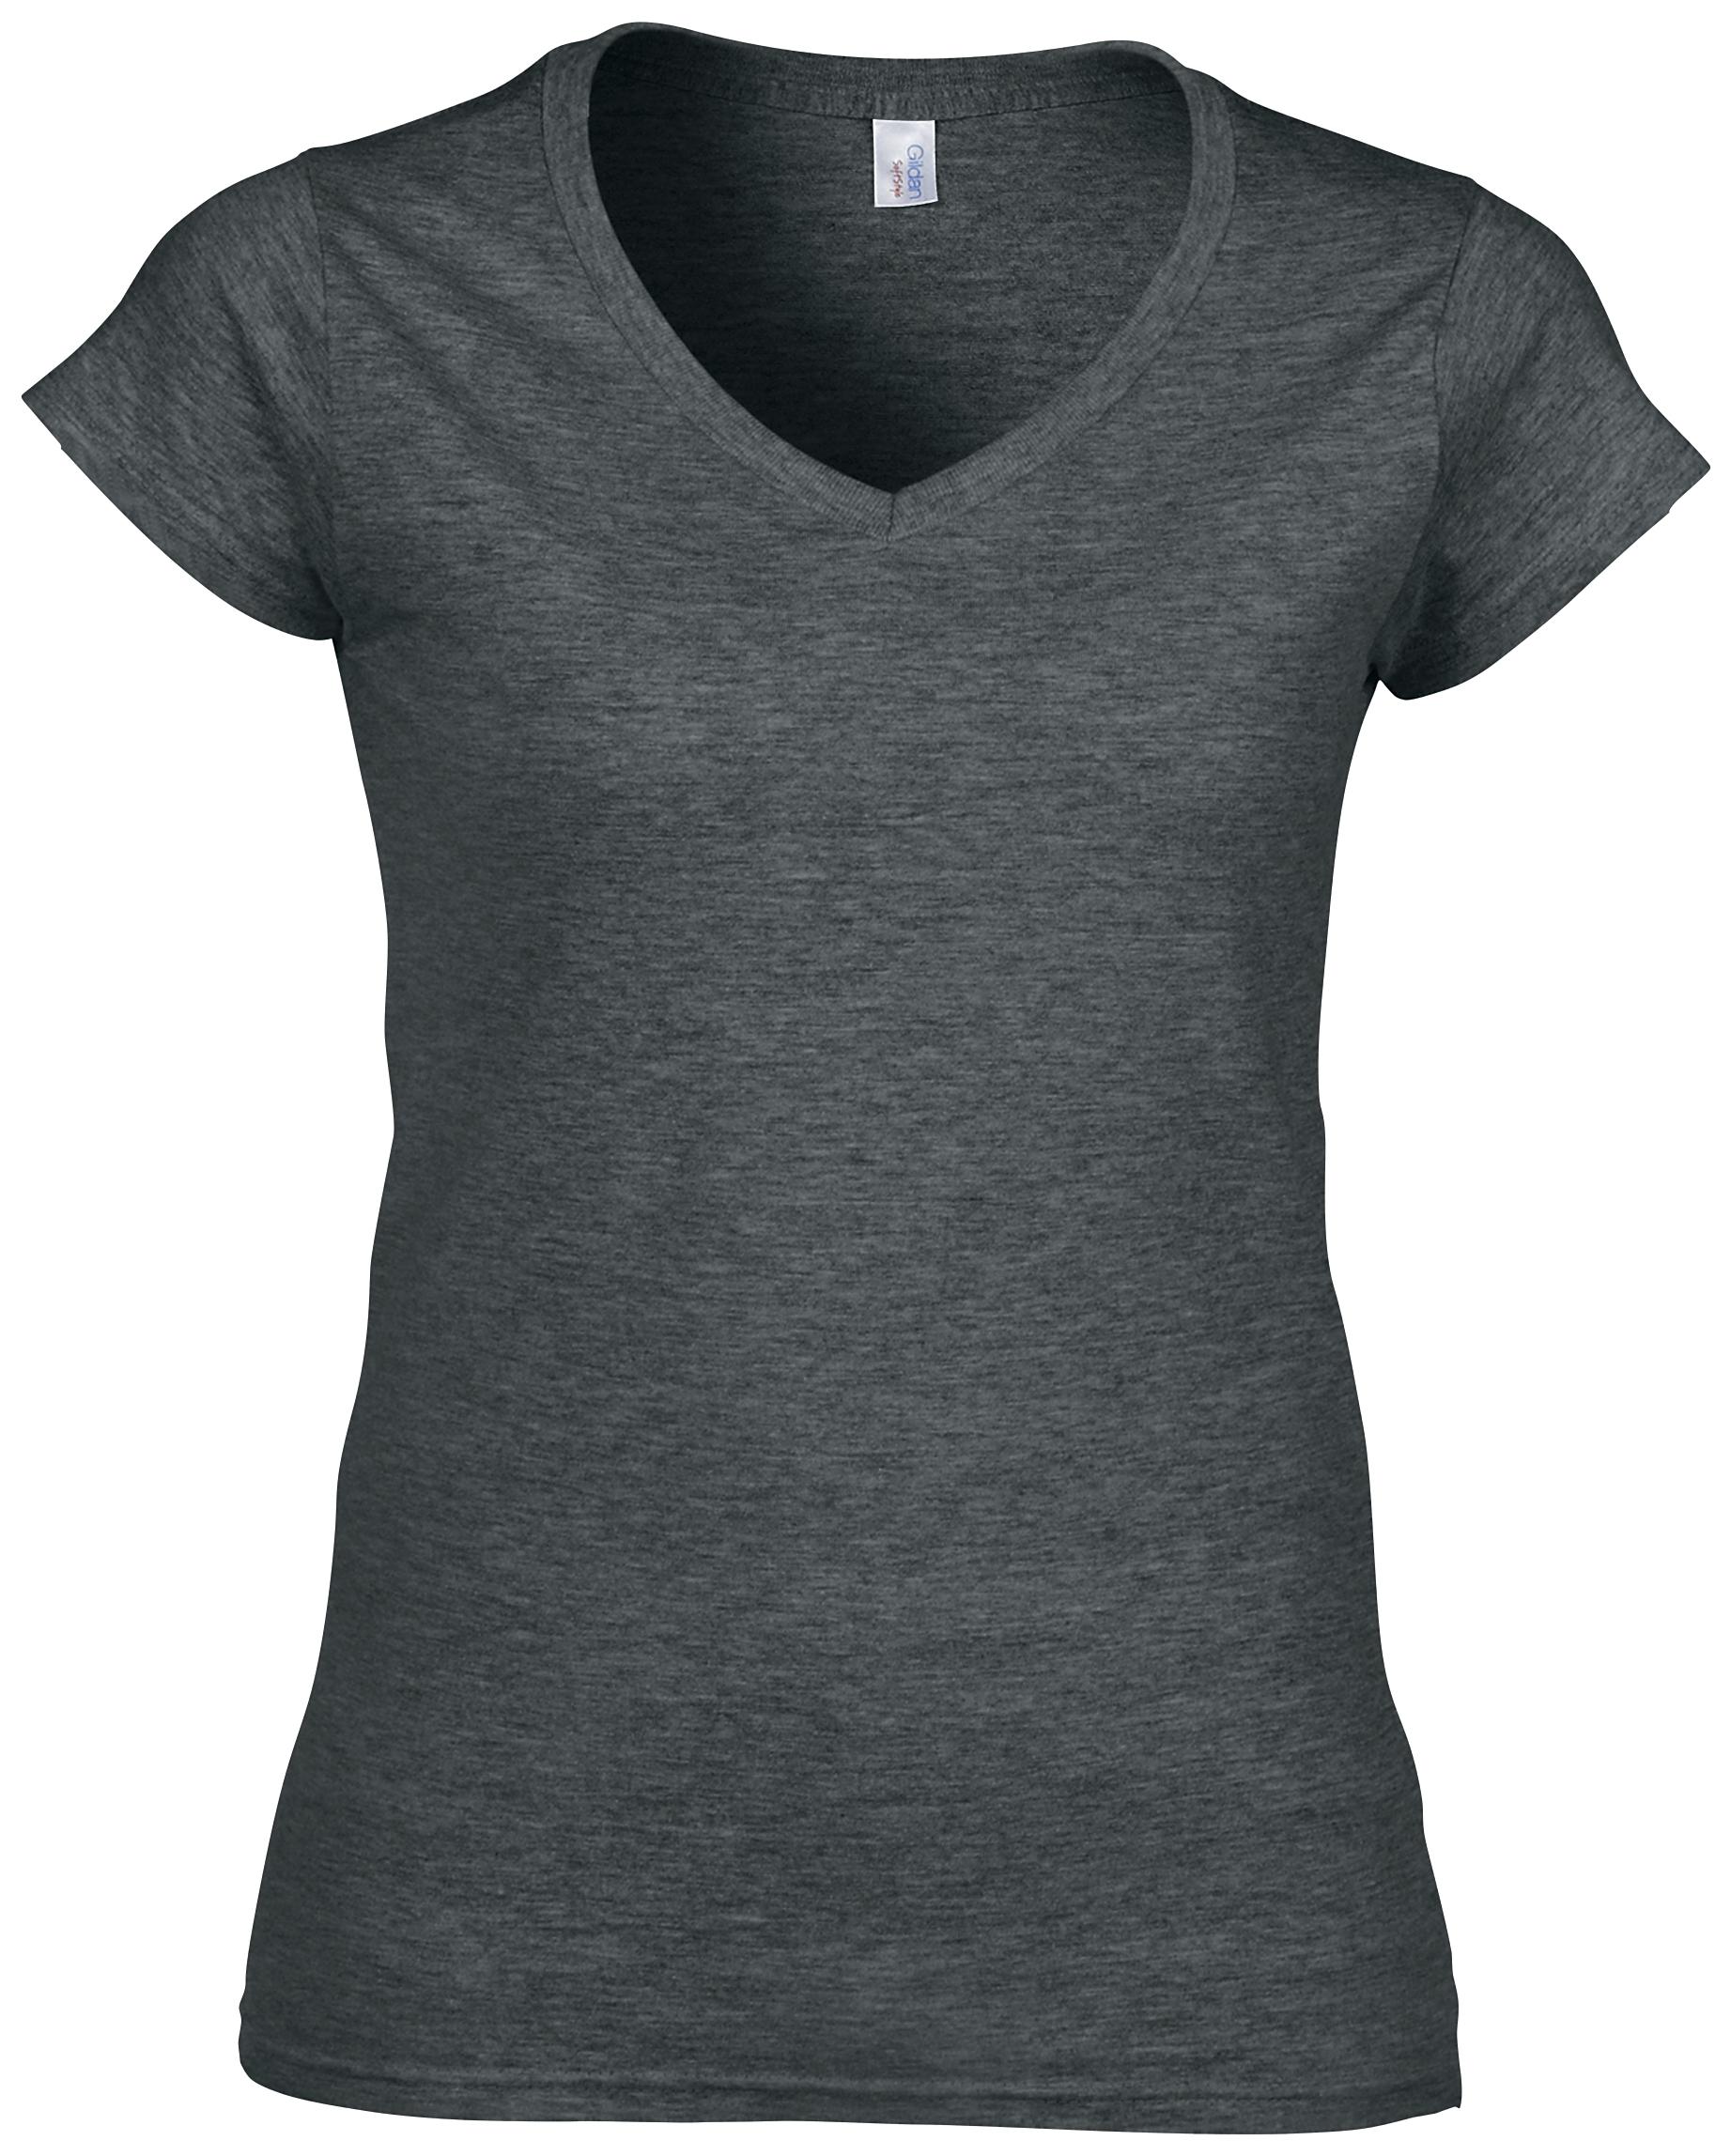 10fea88e077e New GILDAN Womens Ladies Soft Cotton Fitted V Neck T Shirt in 9 ...